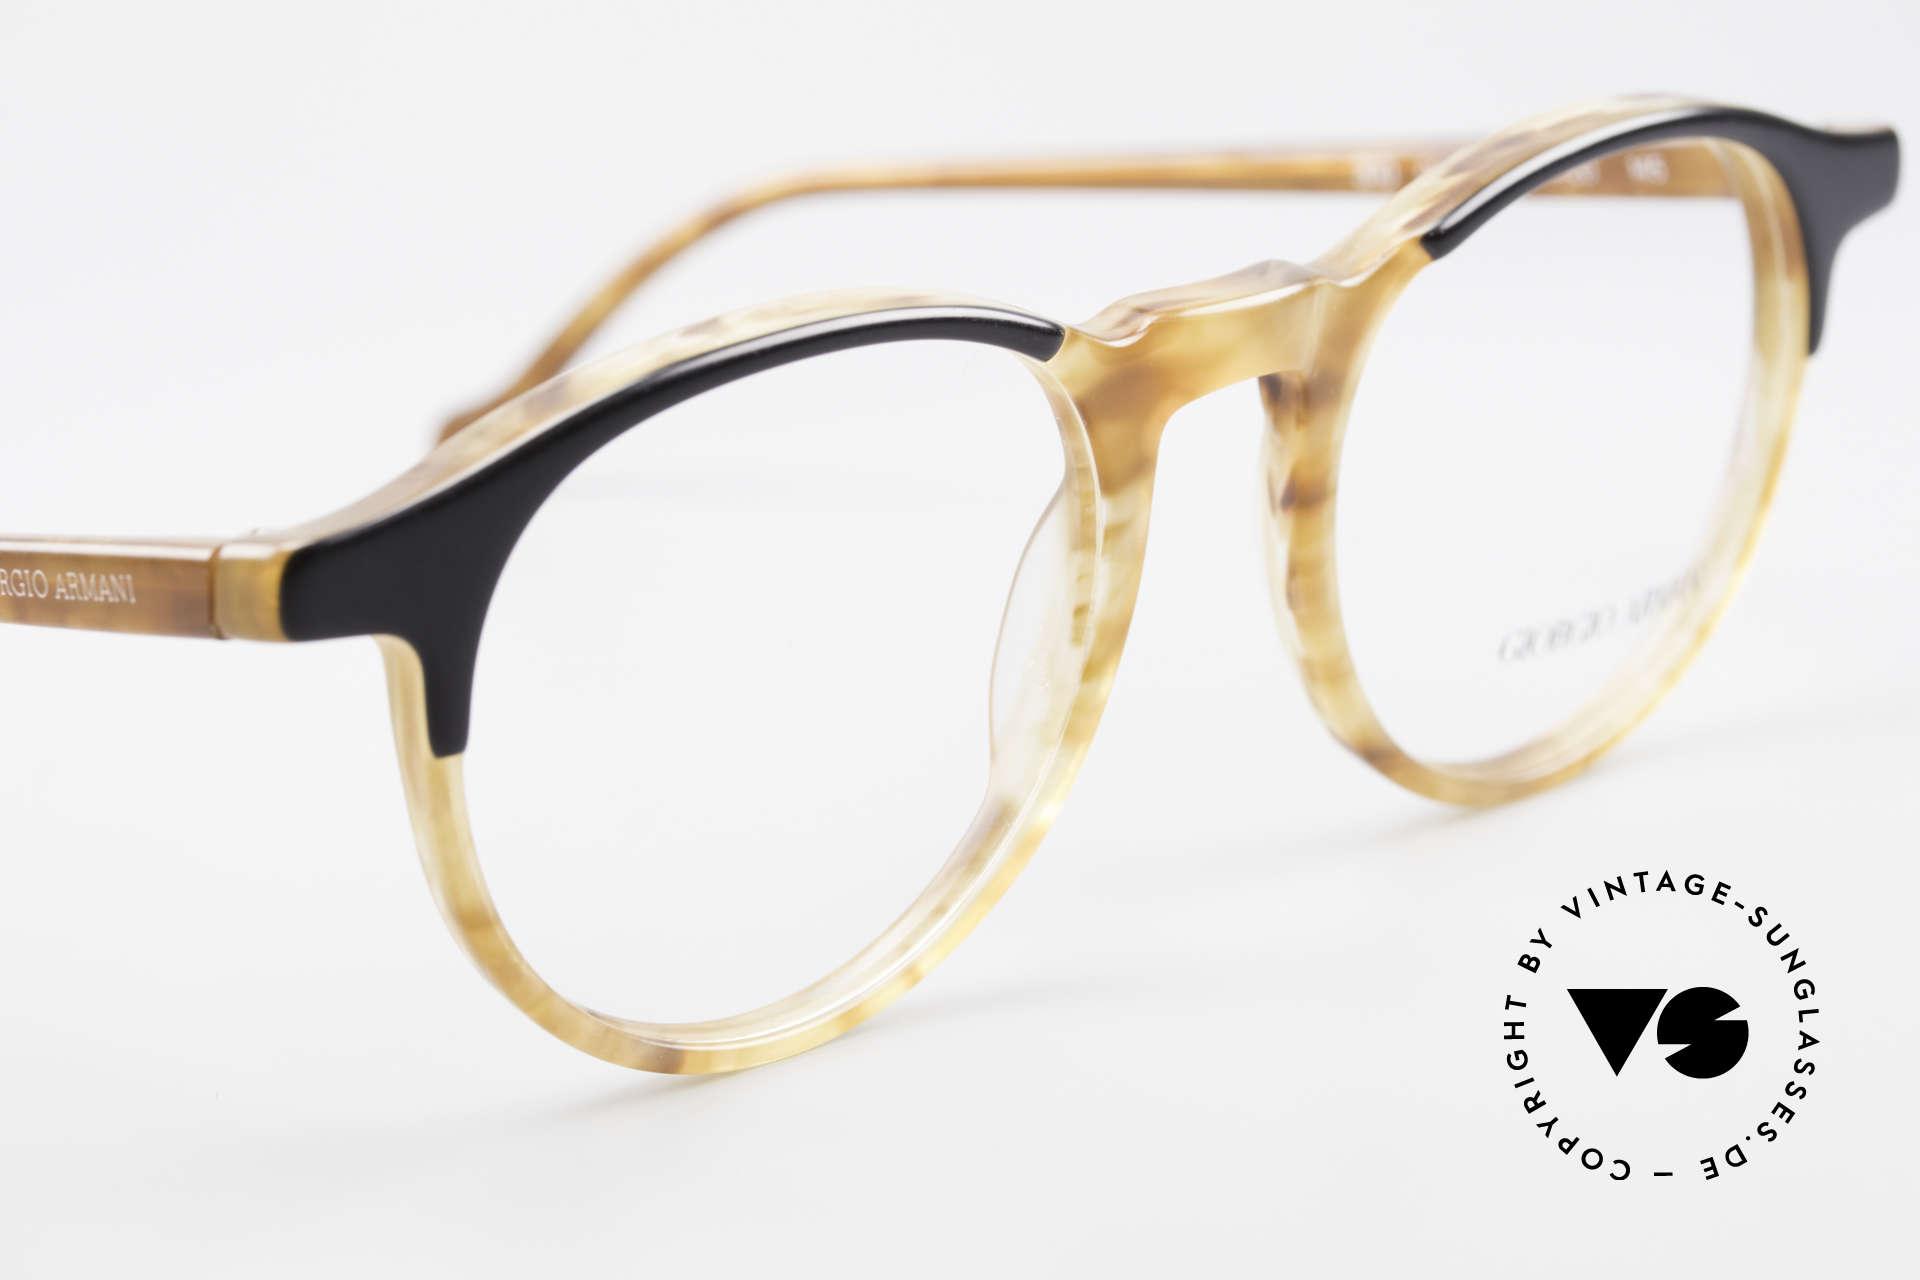 Giorgio Armani 301 Johnny Depp Style Panto Frame, never worn (like all our vintage Giorgio Armani glasses), Made for Men